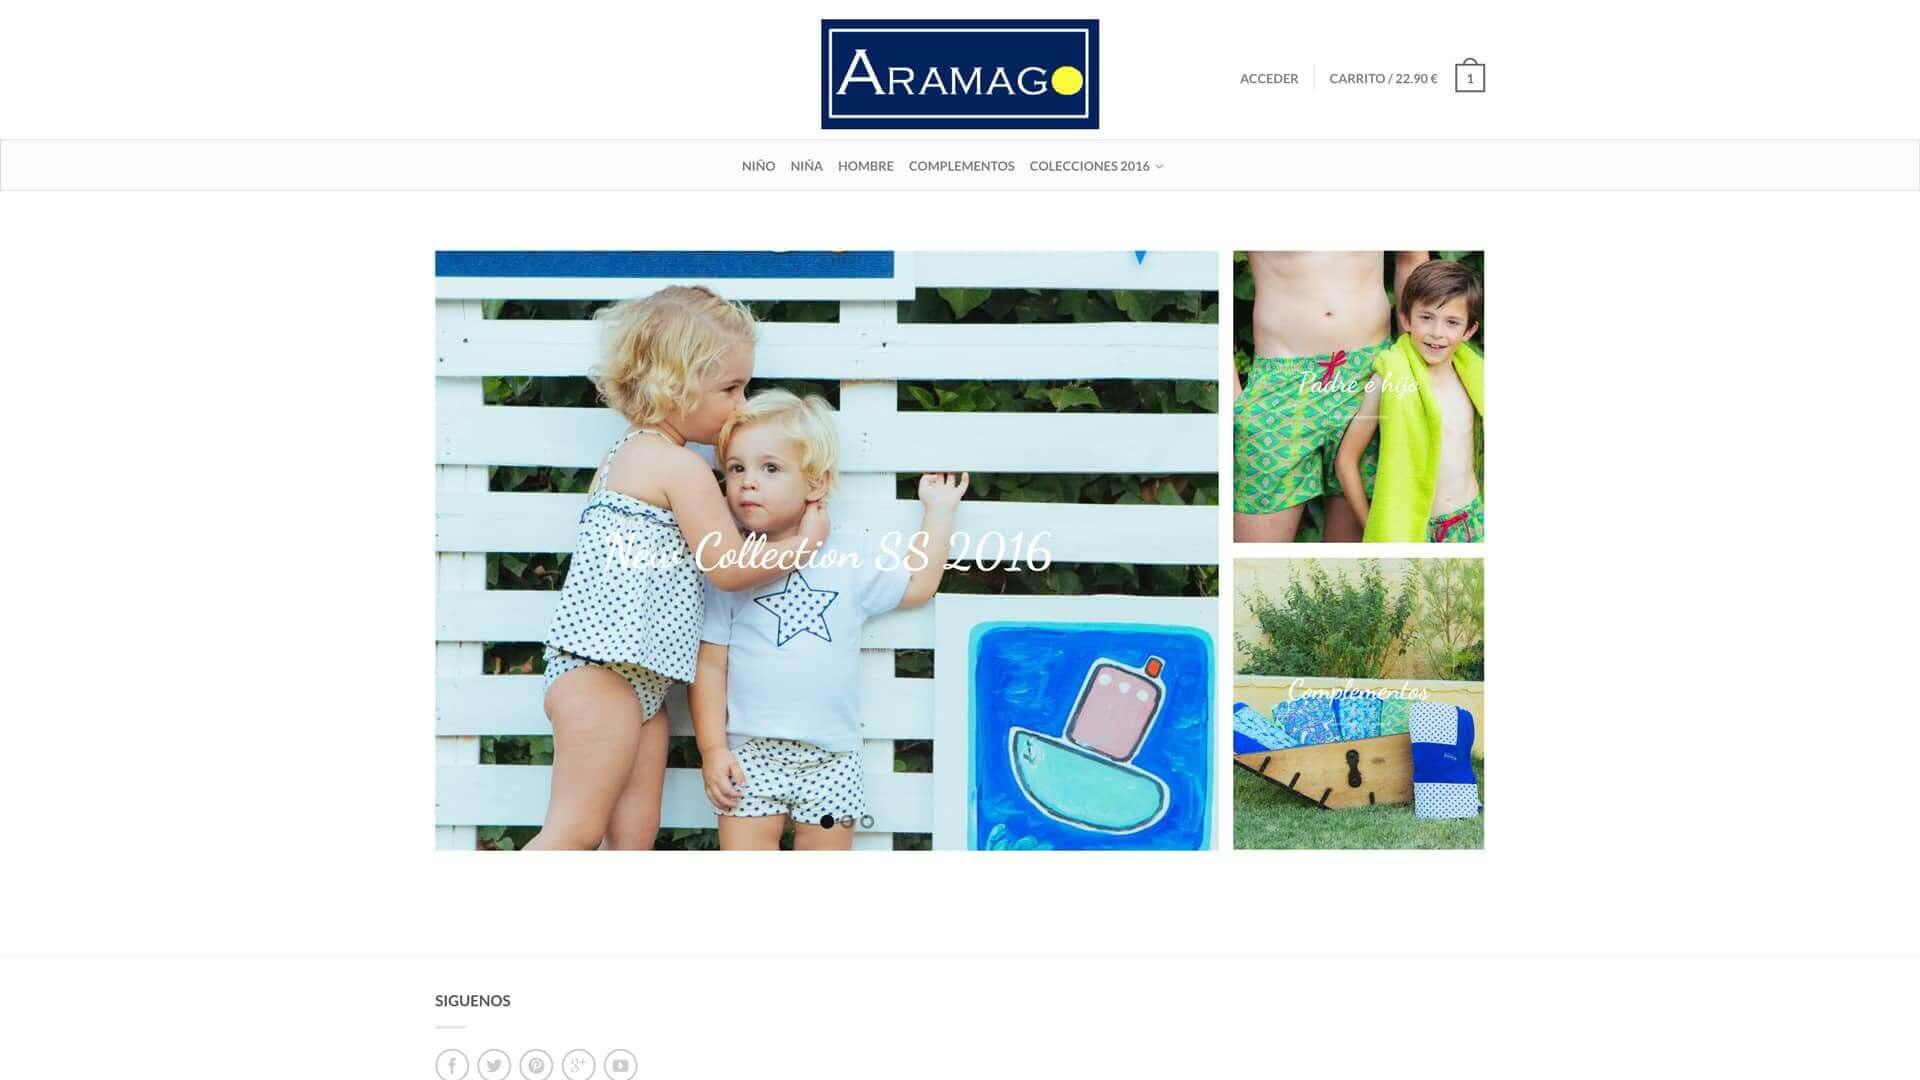 Aramago